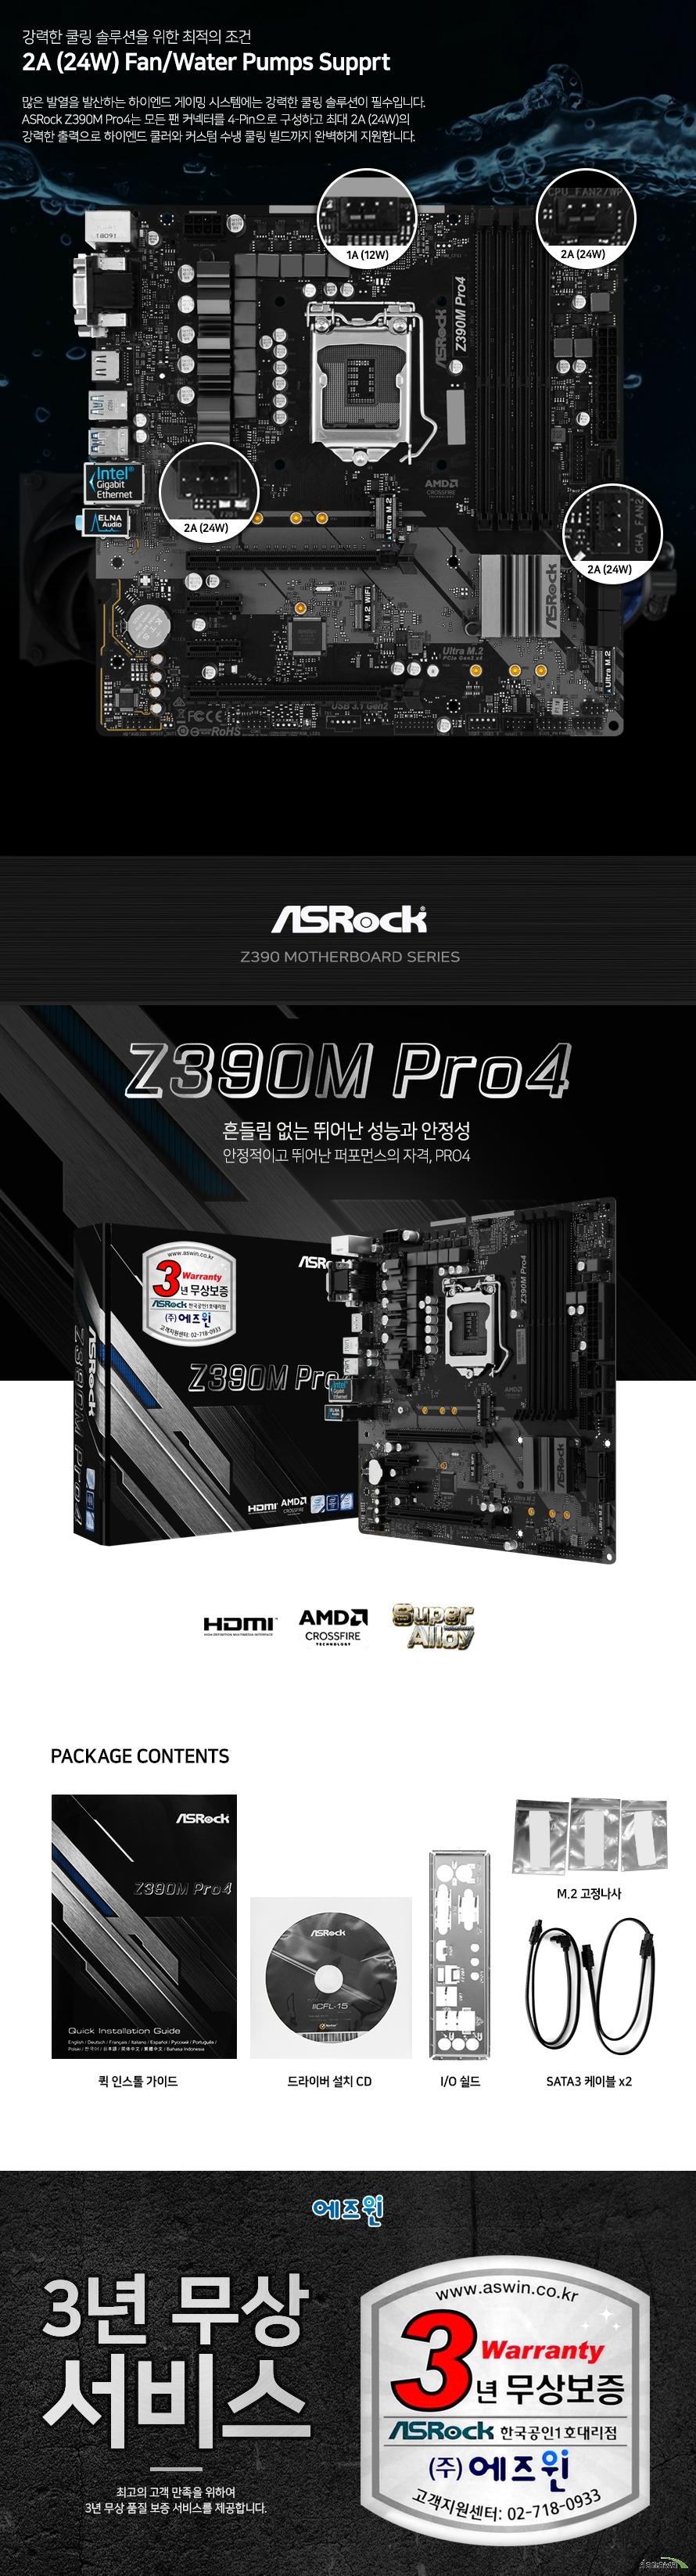 ASRock  Z390M PRO4 에즈윈